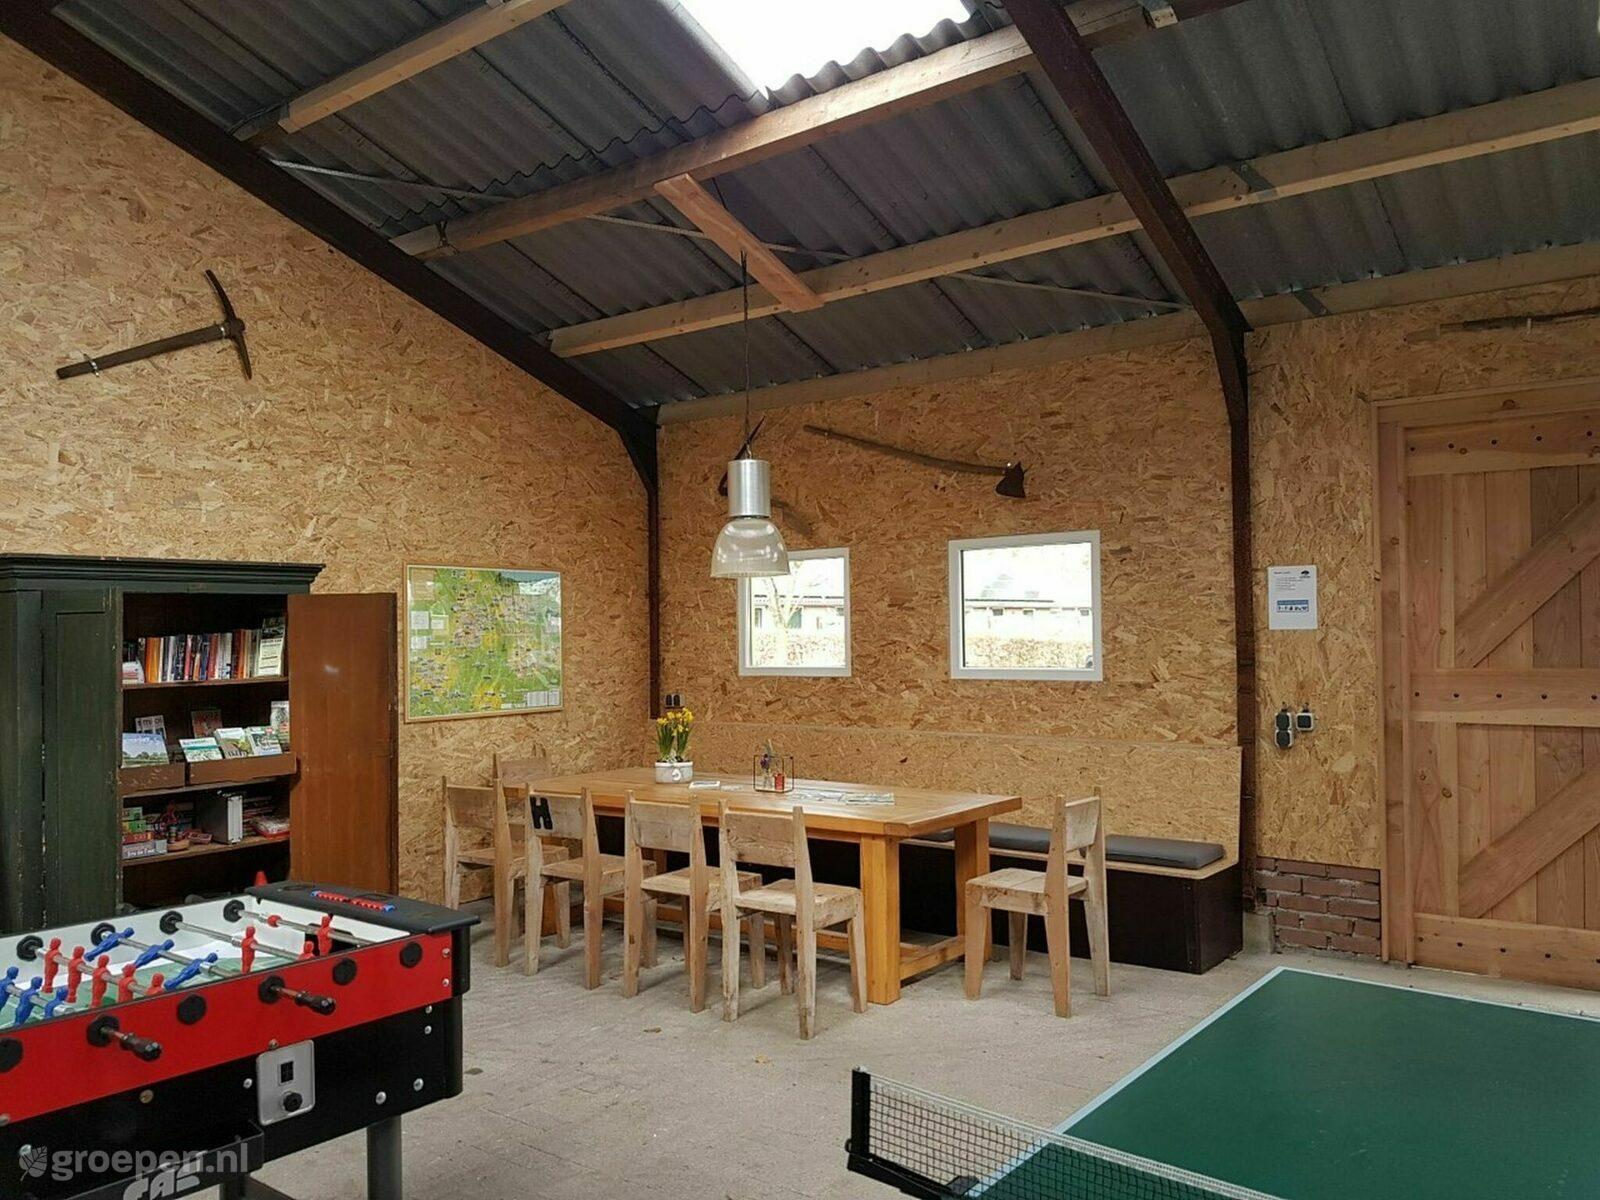 Group accommodation Ruurlo